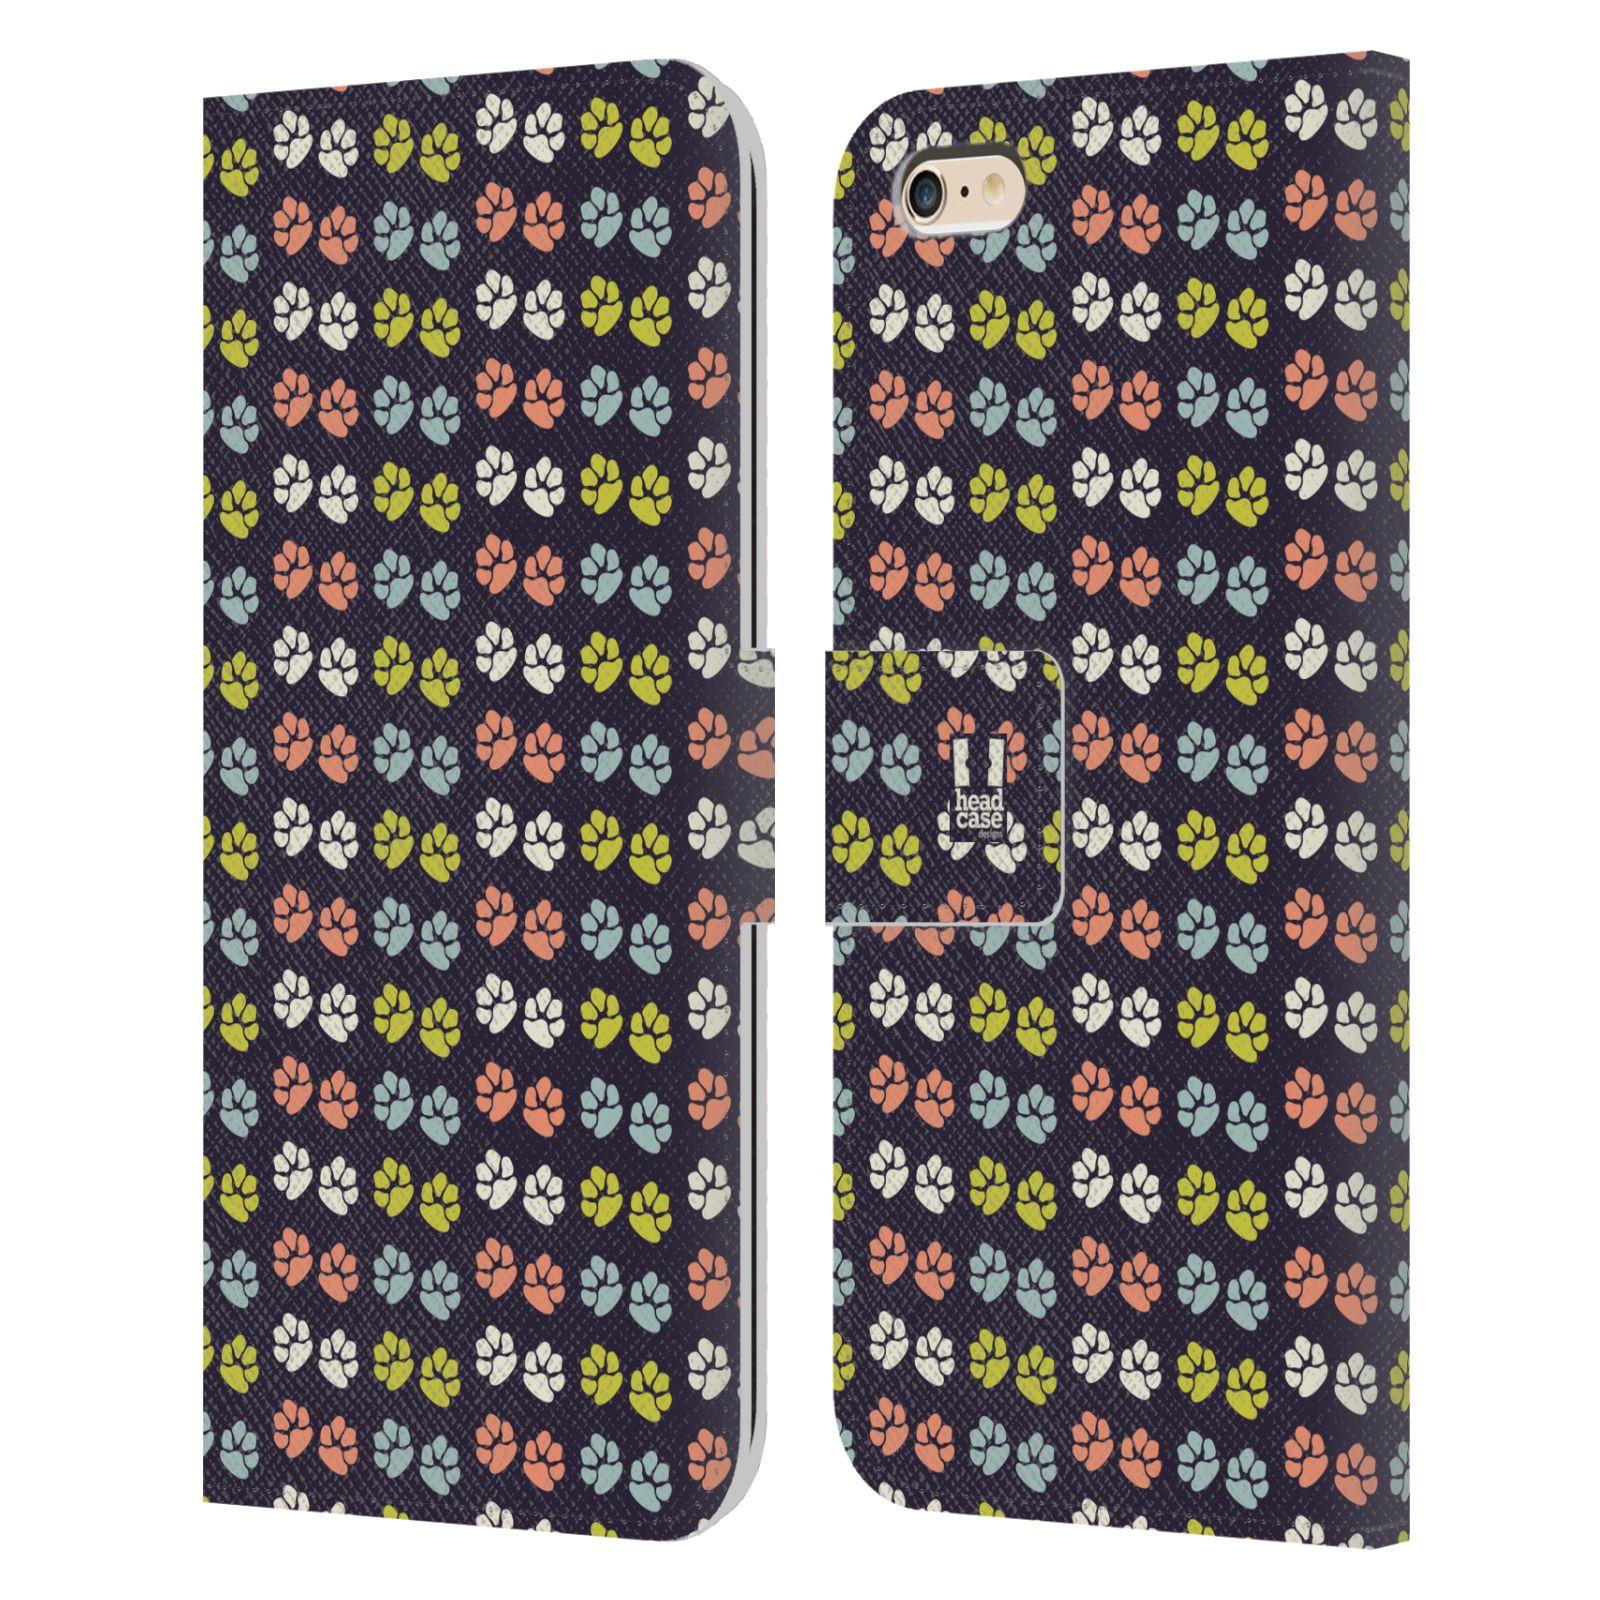 HEAD CASE Flipové pouzdro pro mobil Apple Iphone 6 PLUS / 6S PLUS Pejsek ťapky barevné RETRO